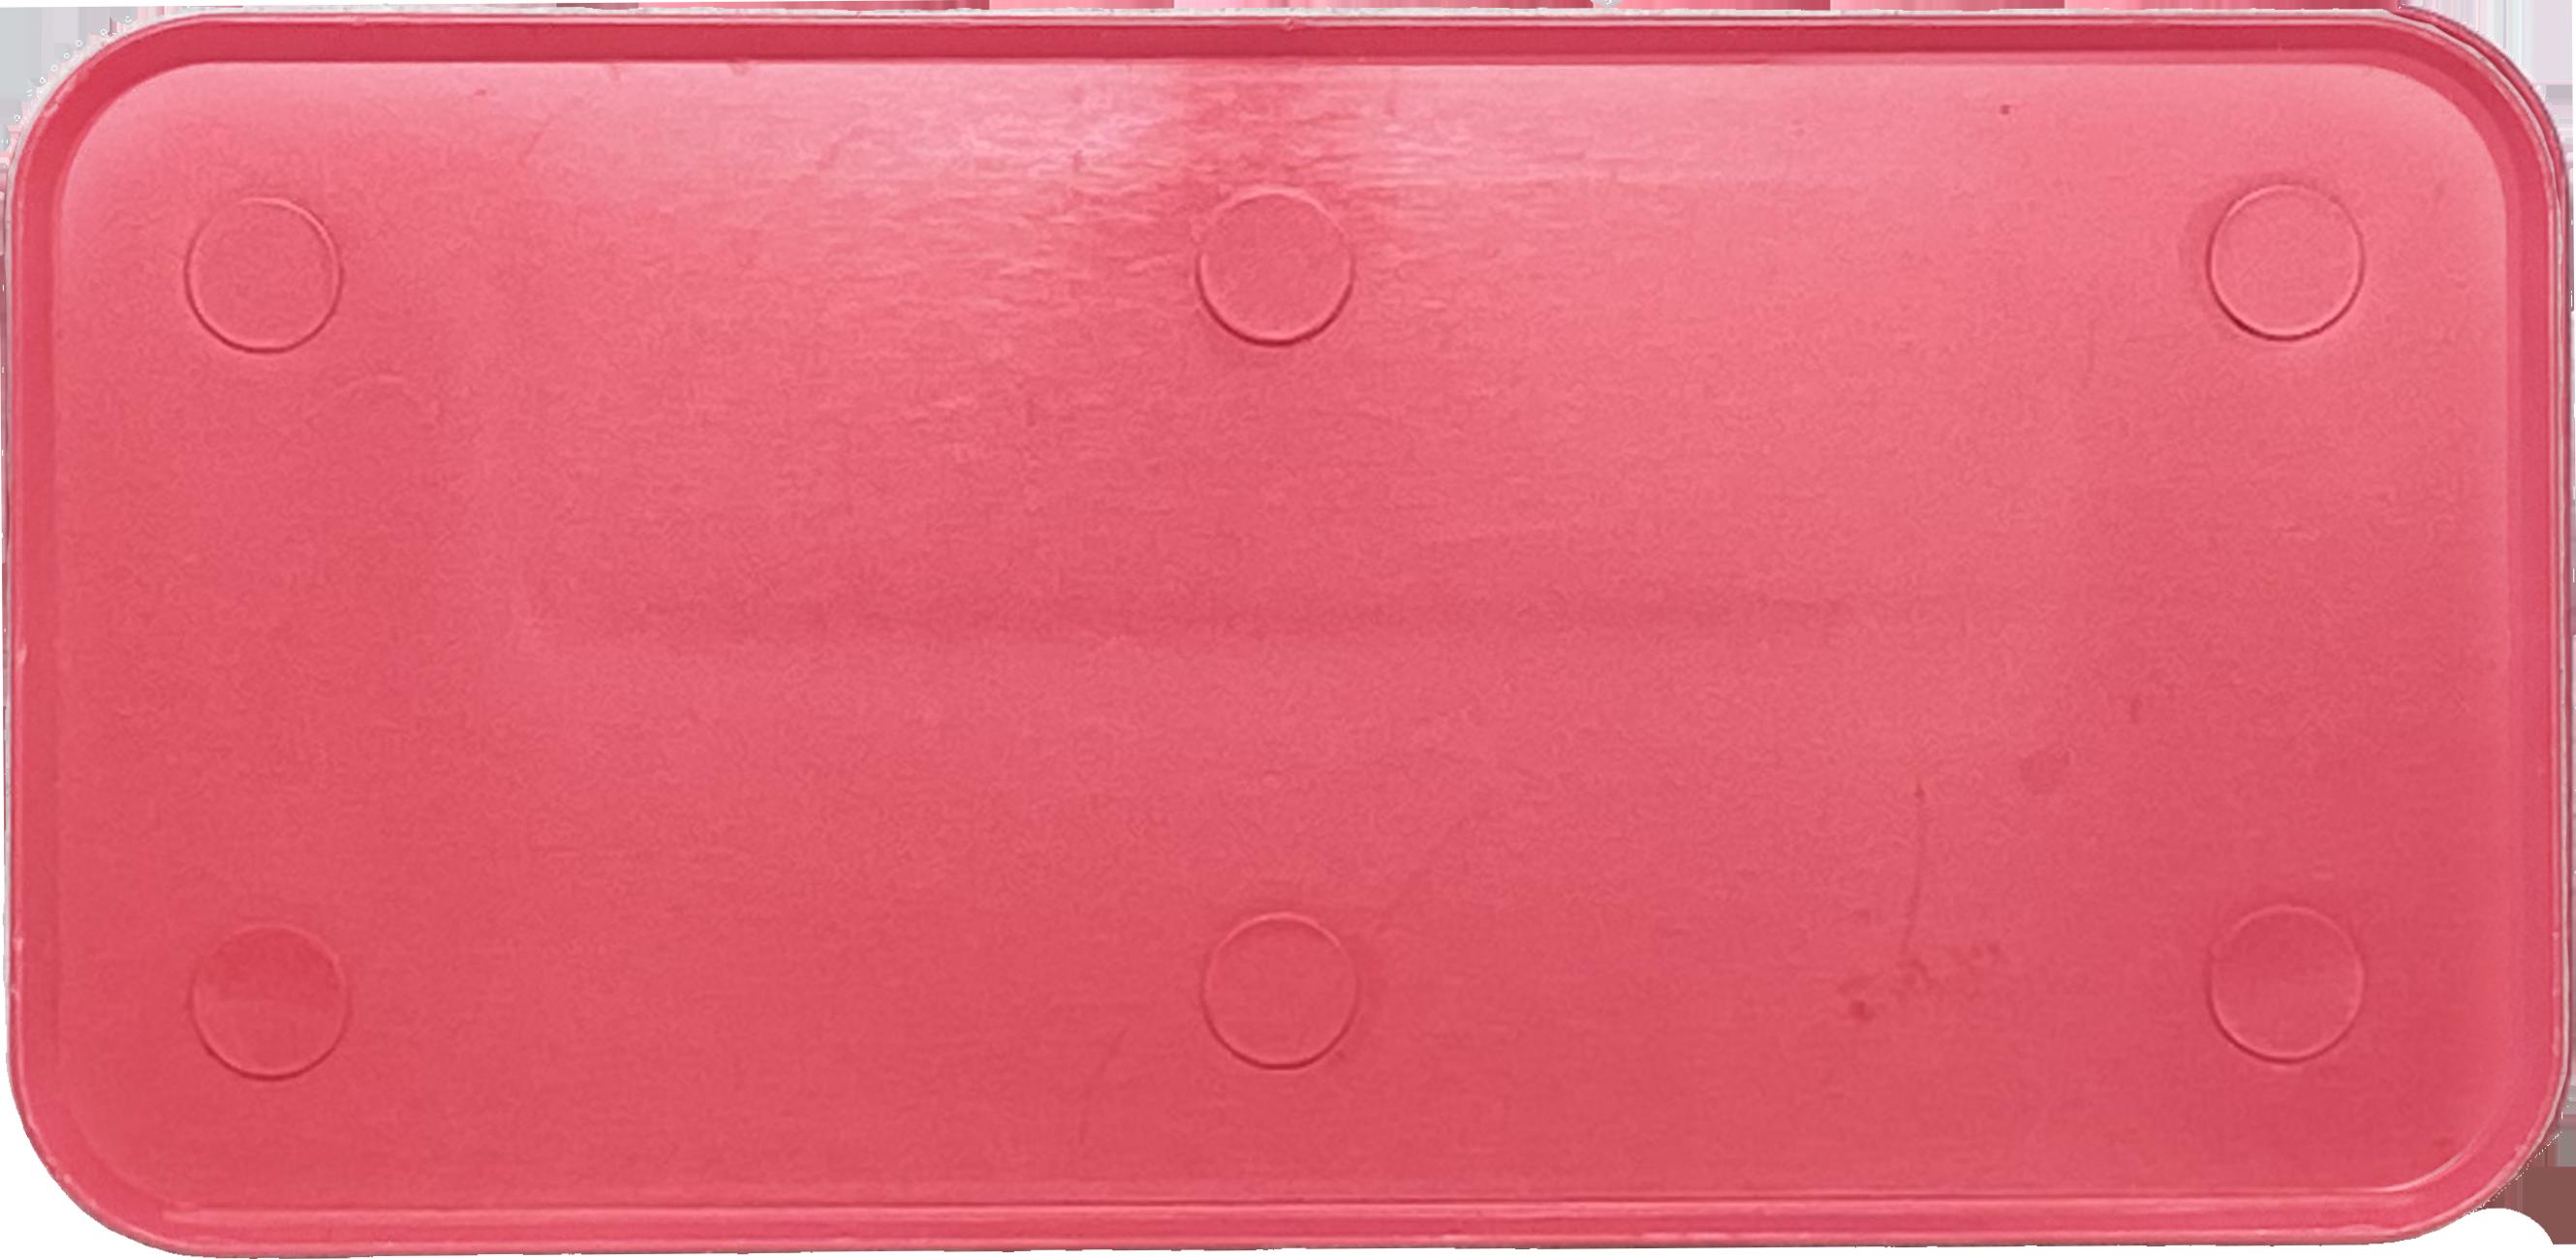 pink-backing.png